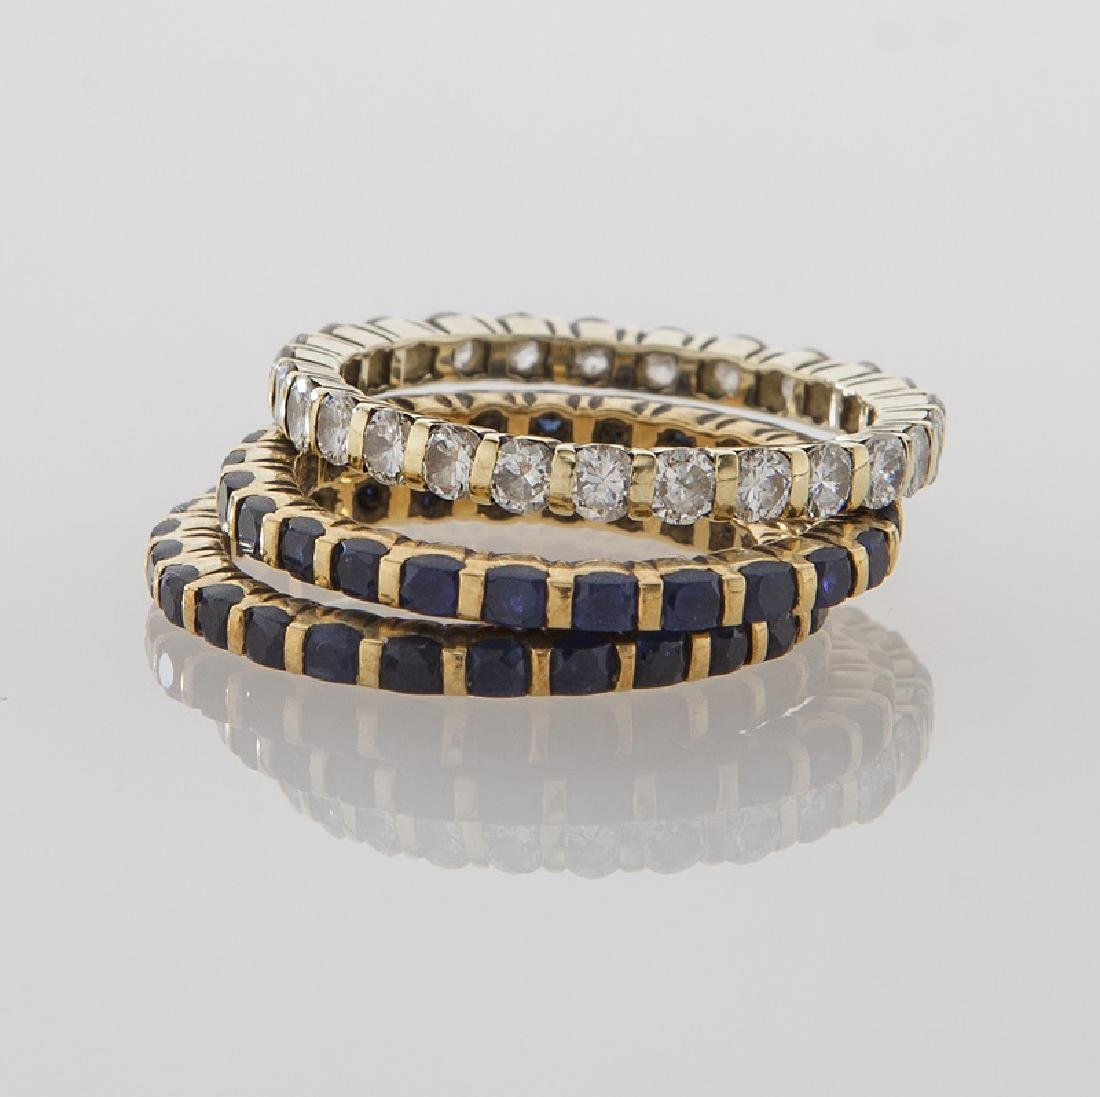 (3) Tiffany 18K, diamond & sapphire eternity - 2